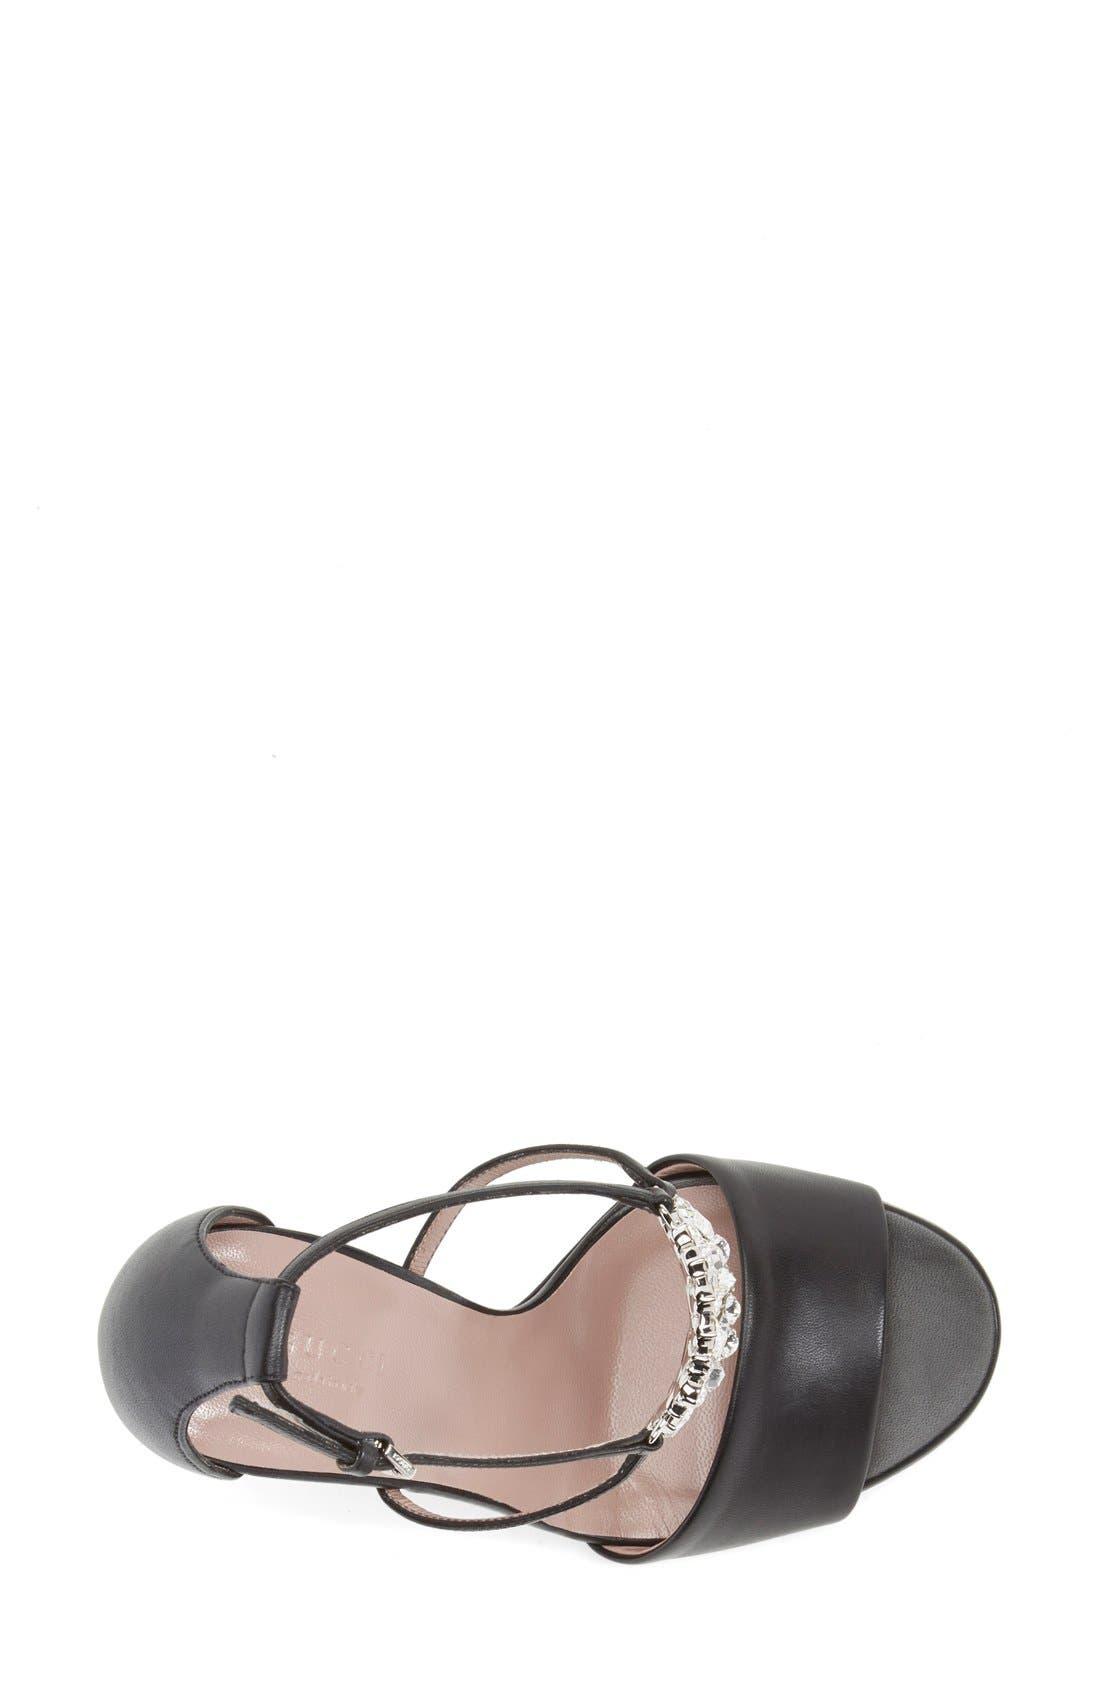 Alternate Image 3  - Gucci 'GG' Logo Ankle Strap Sandal (Women)